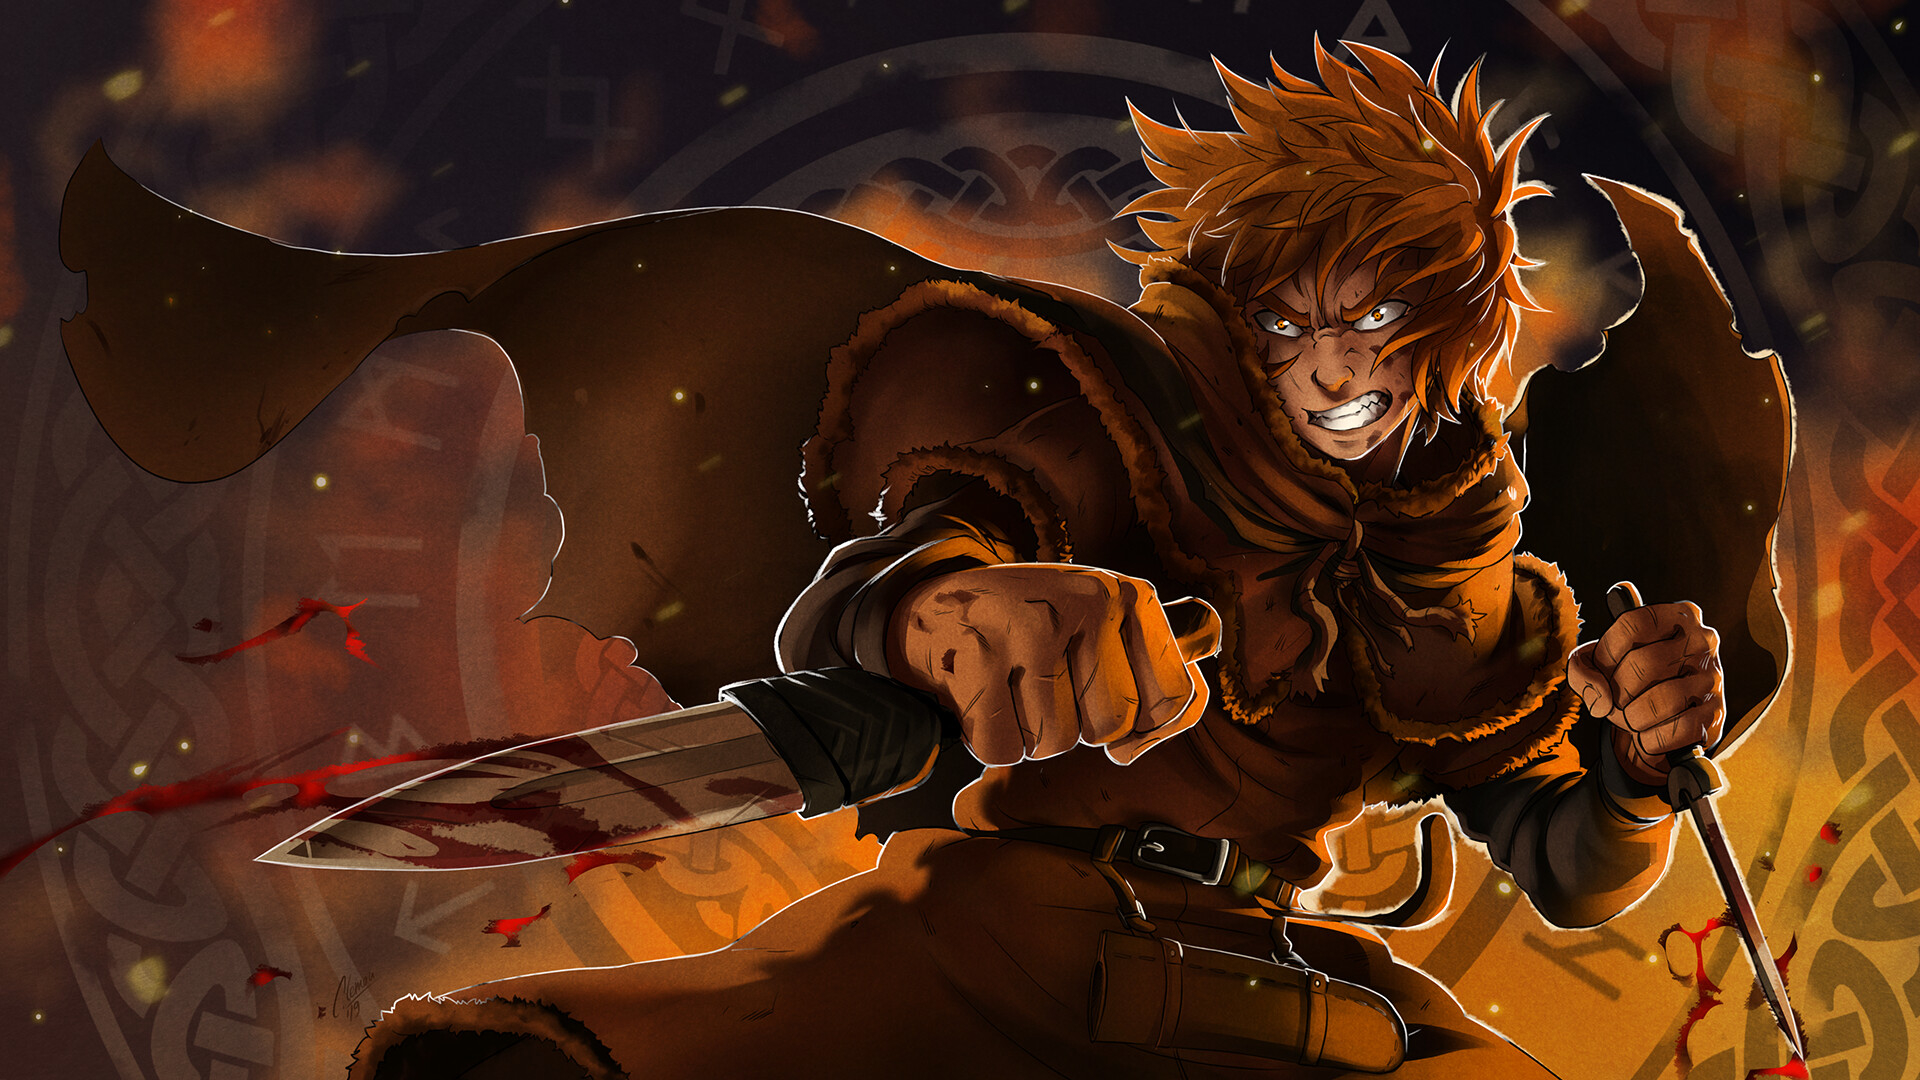 Thorfinn In Vinland Saga Wallpaper Hd Anime 4k Wallpapers